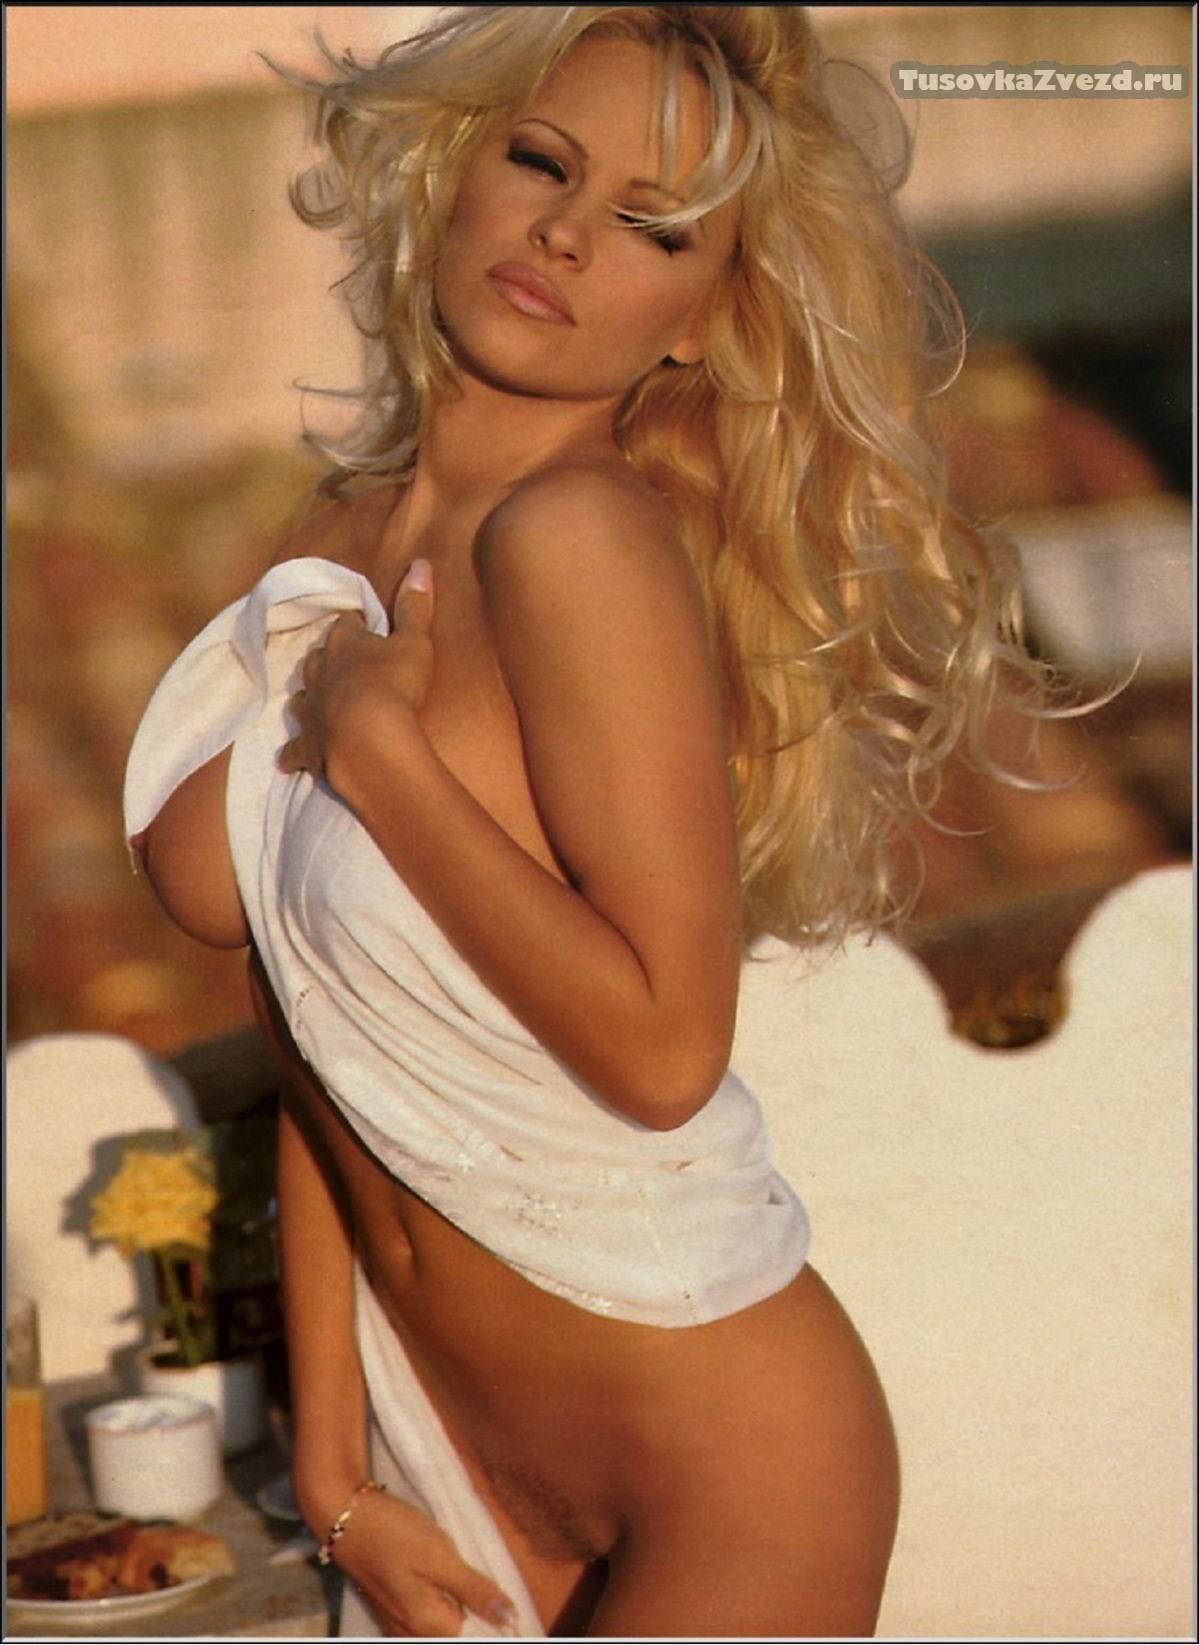 Эротические фото девушек брянска, пышку ебут онлайн